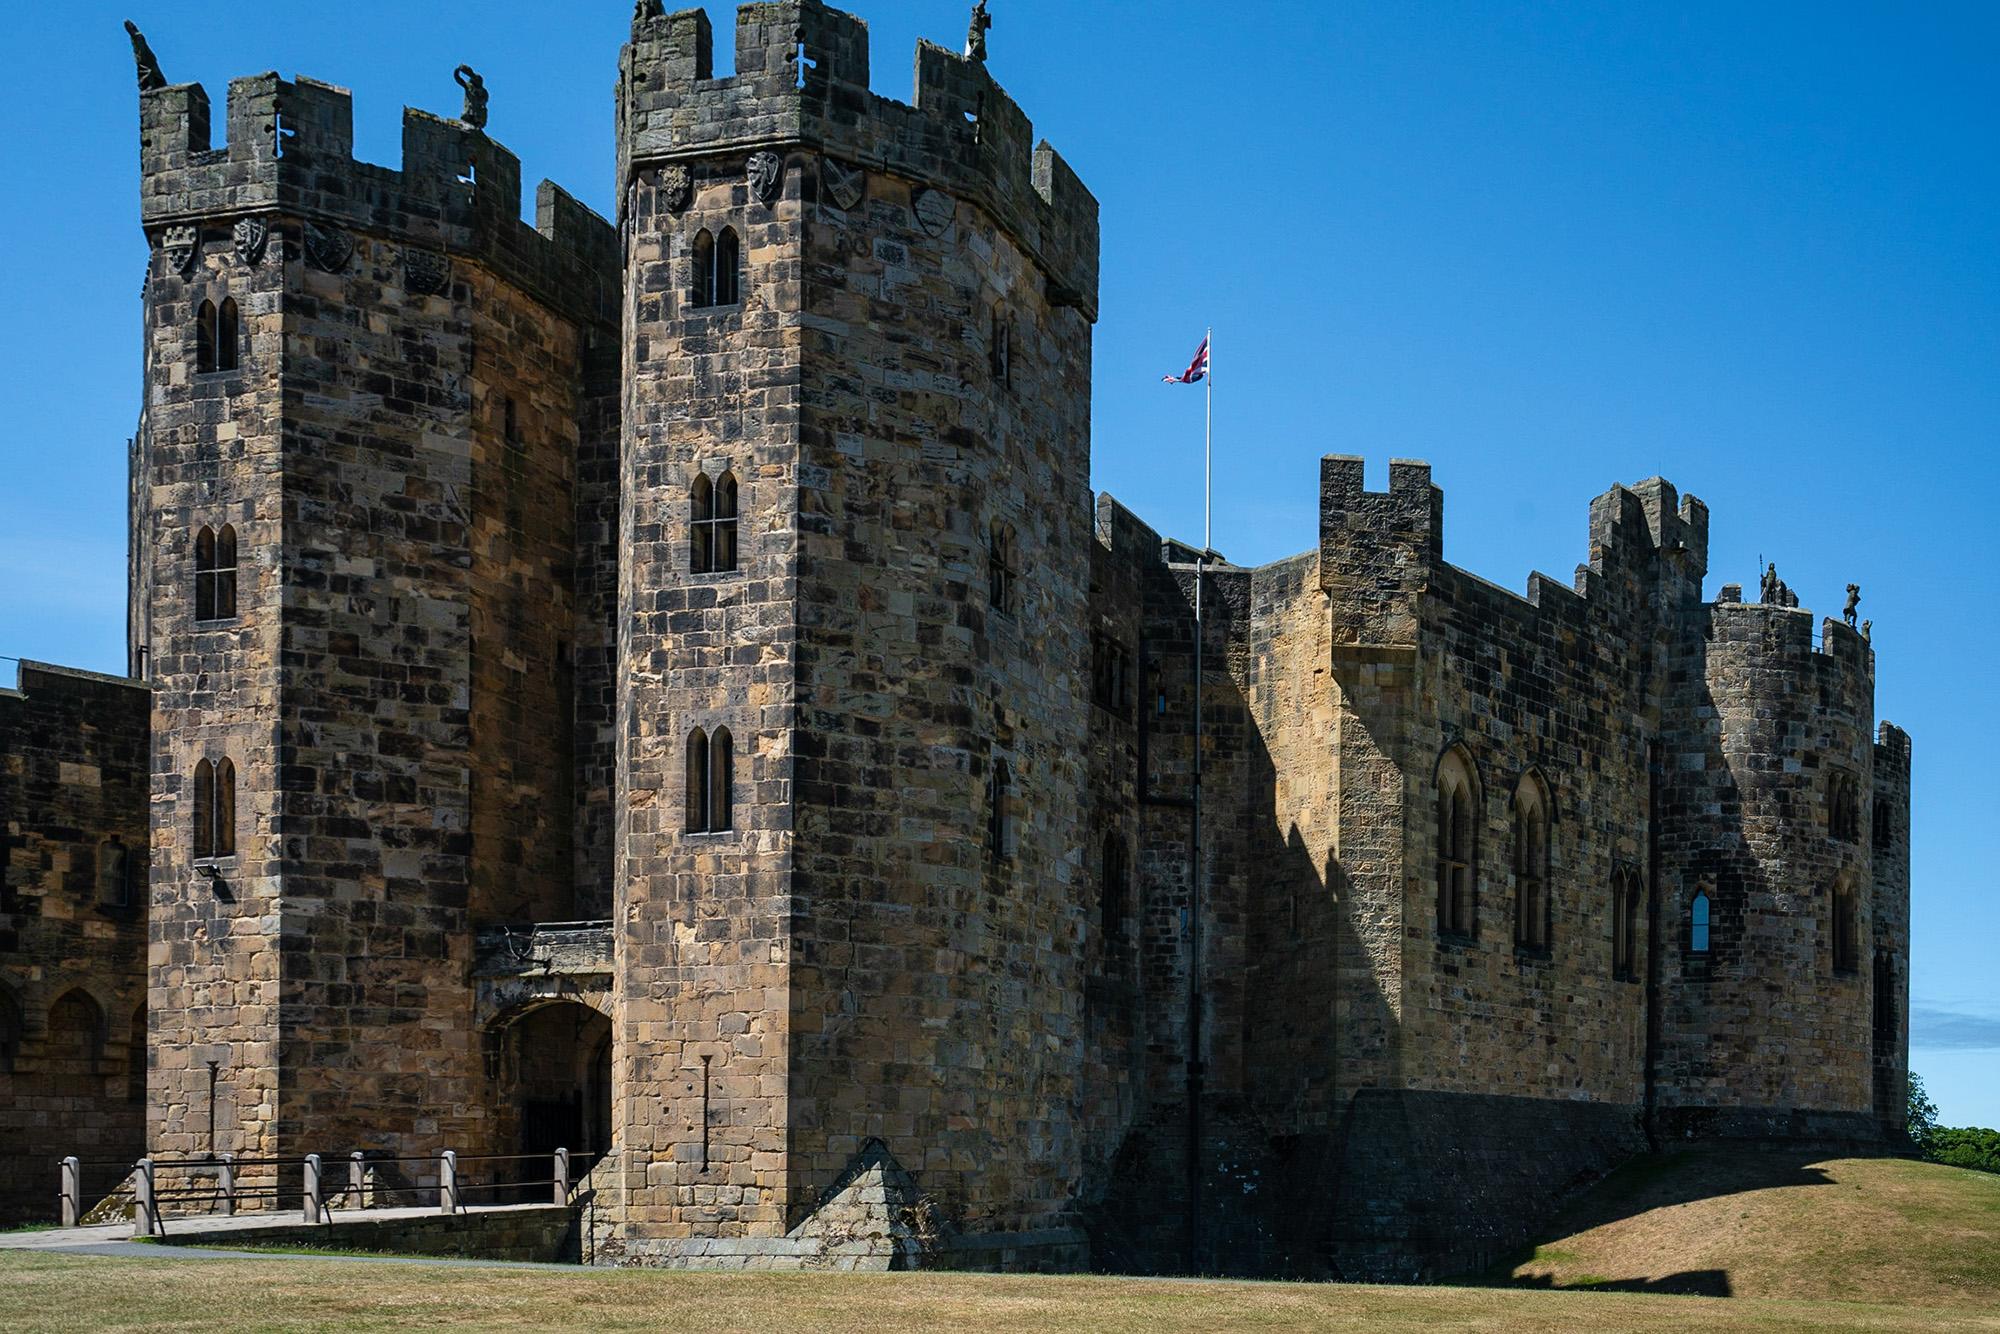 #alnwick, #duke, #duchess, #towers, #castle, #duchess, #northumberland, #keep, #smithson, #smithsonian, #percy